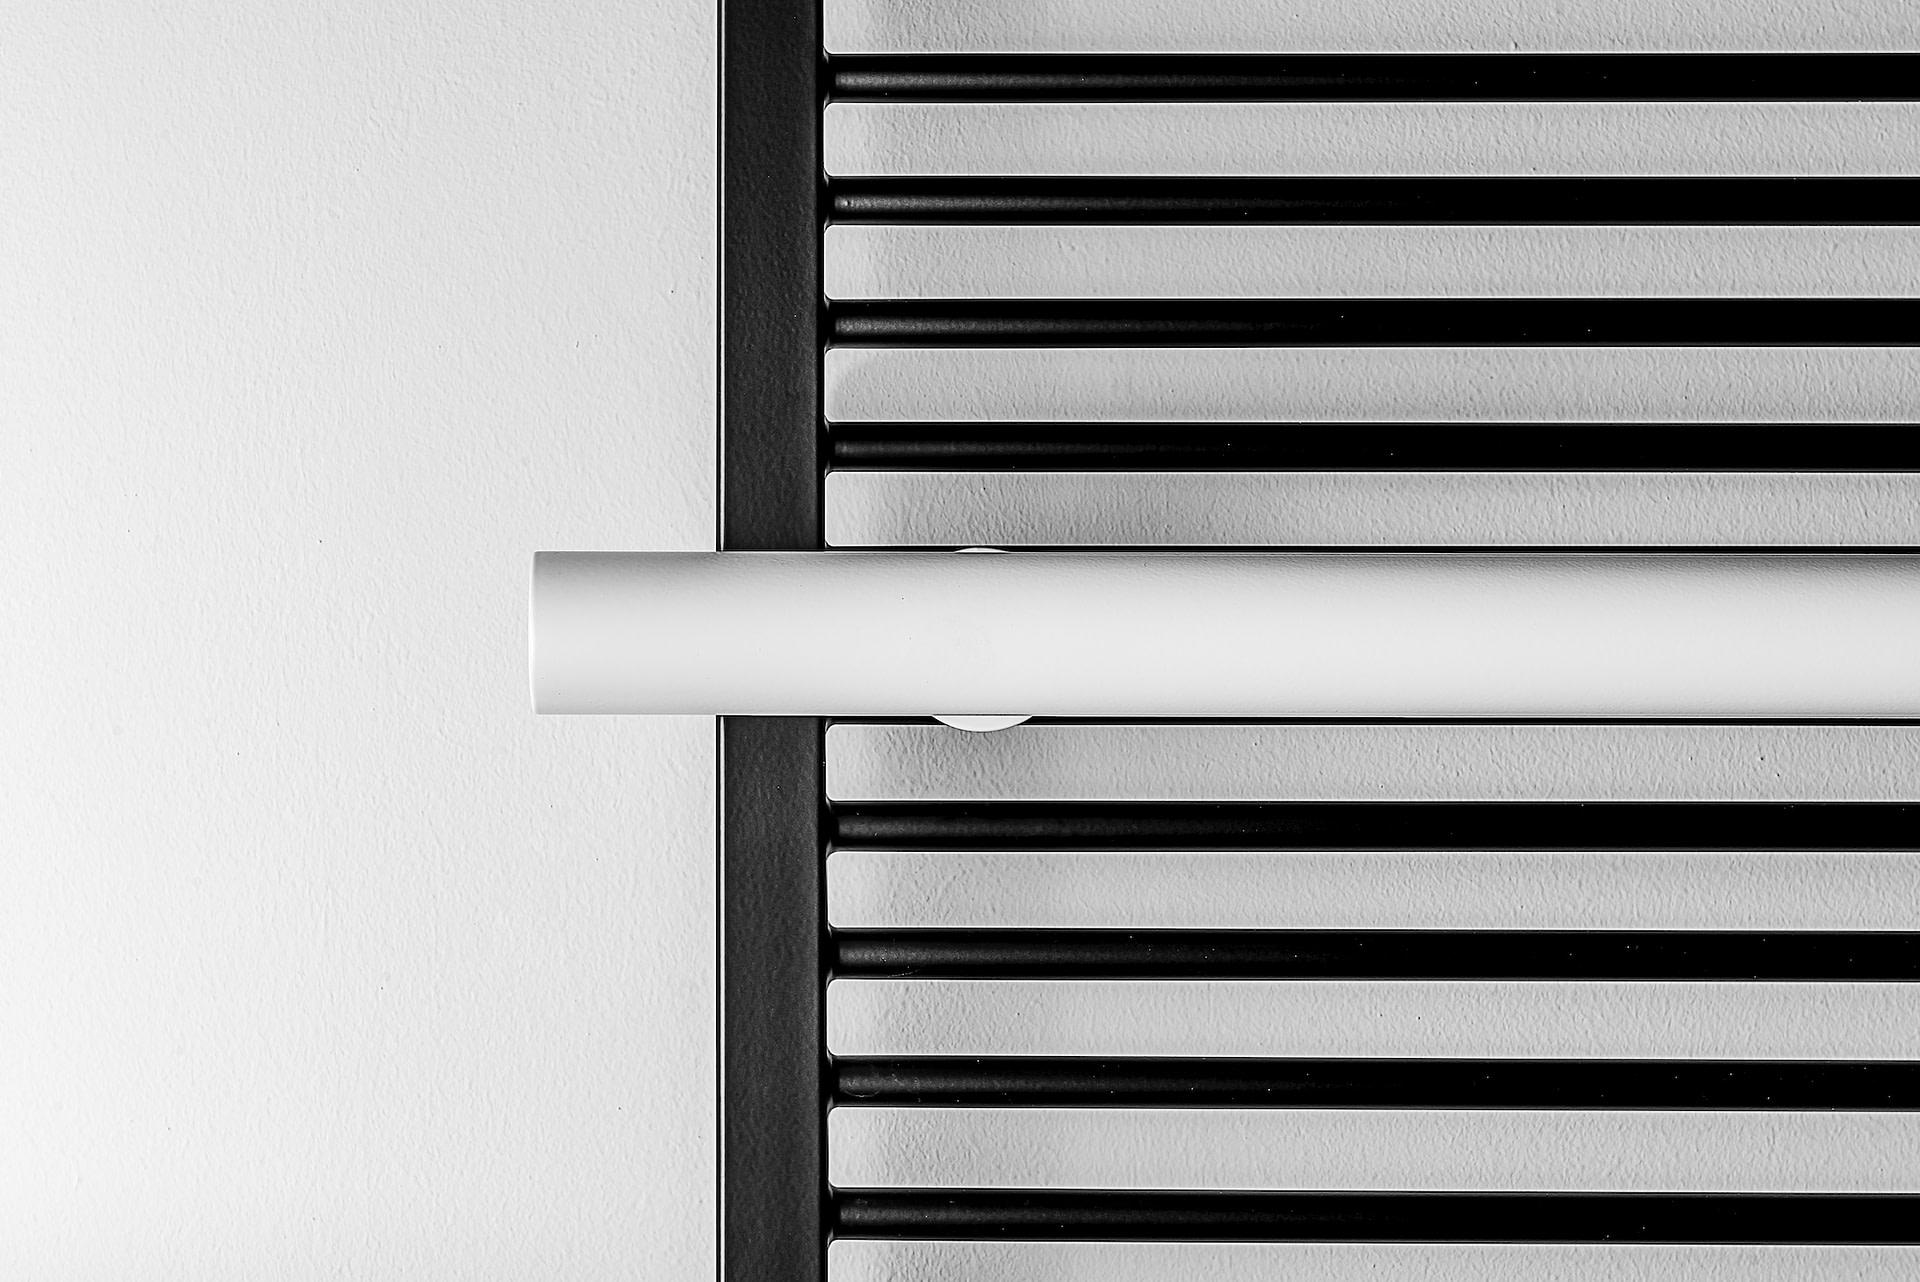 Termosifoni, radiatori e scaldasalviette su misura